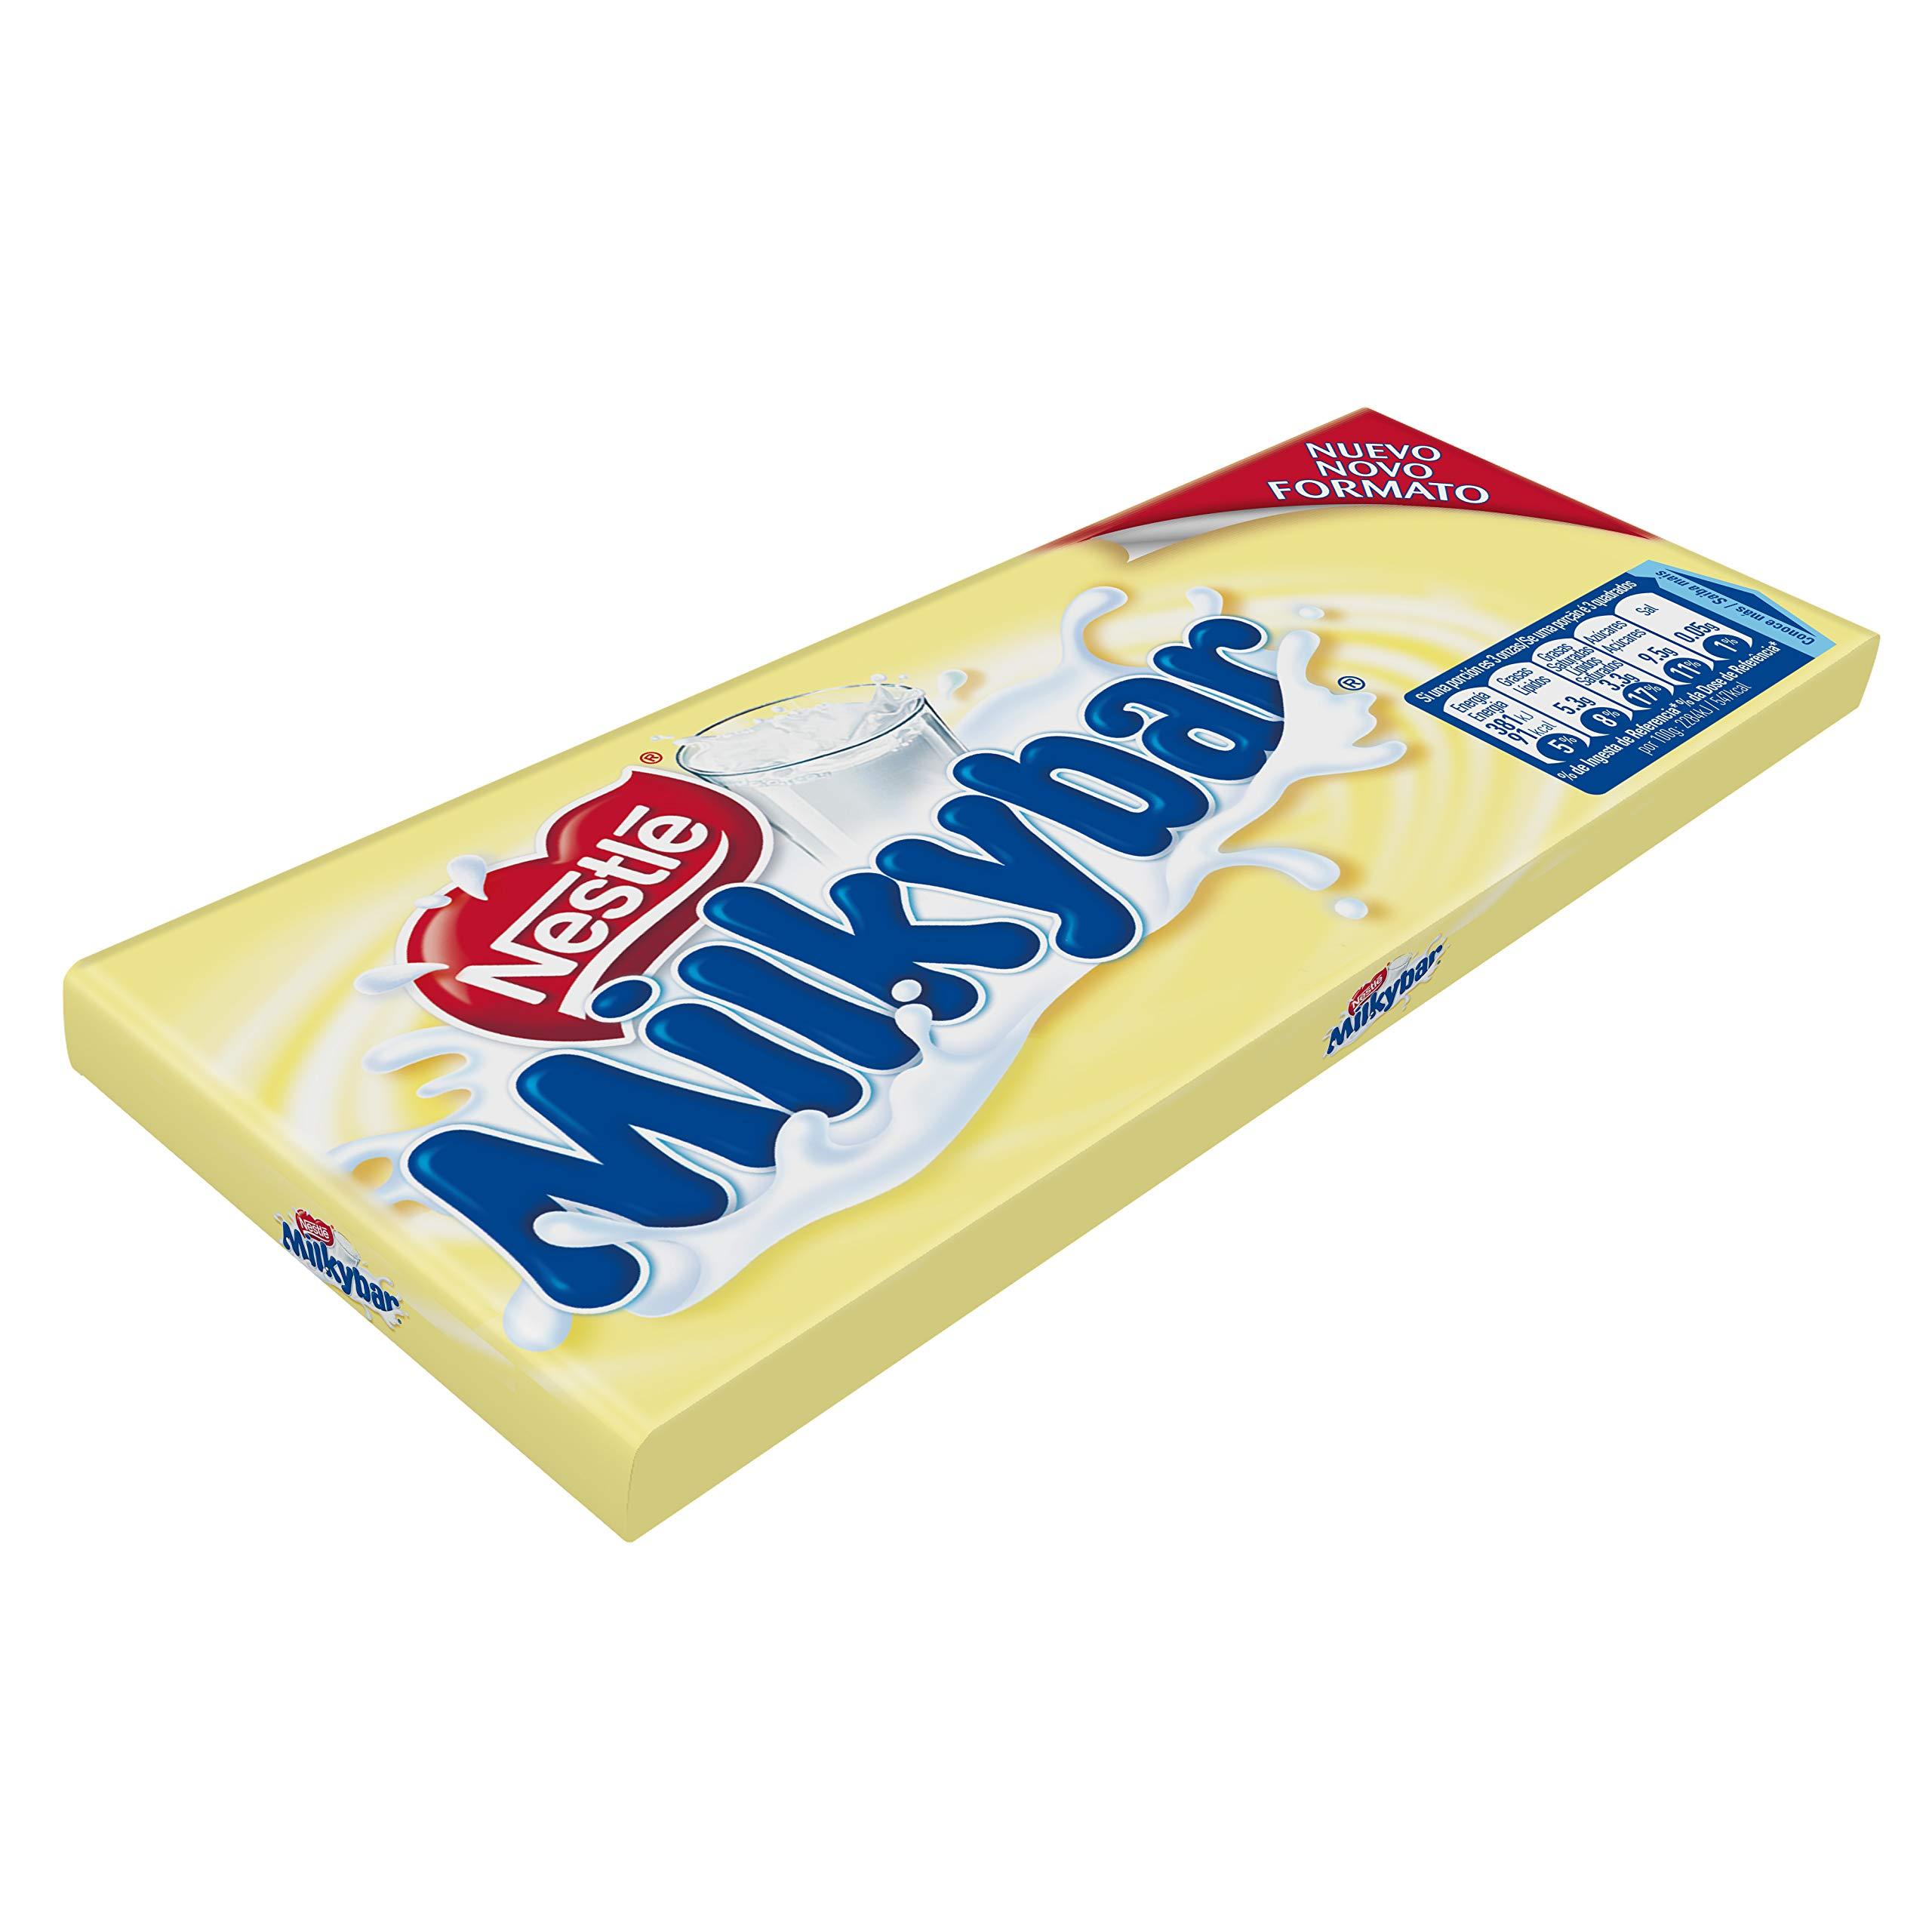 Nestlé Milkybar Chocolate Blanco - Tableta de chocolate blanco 20x100g